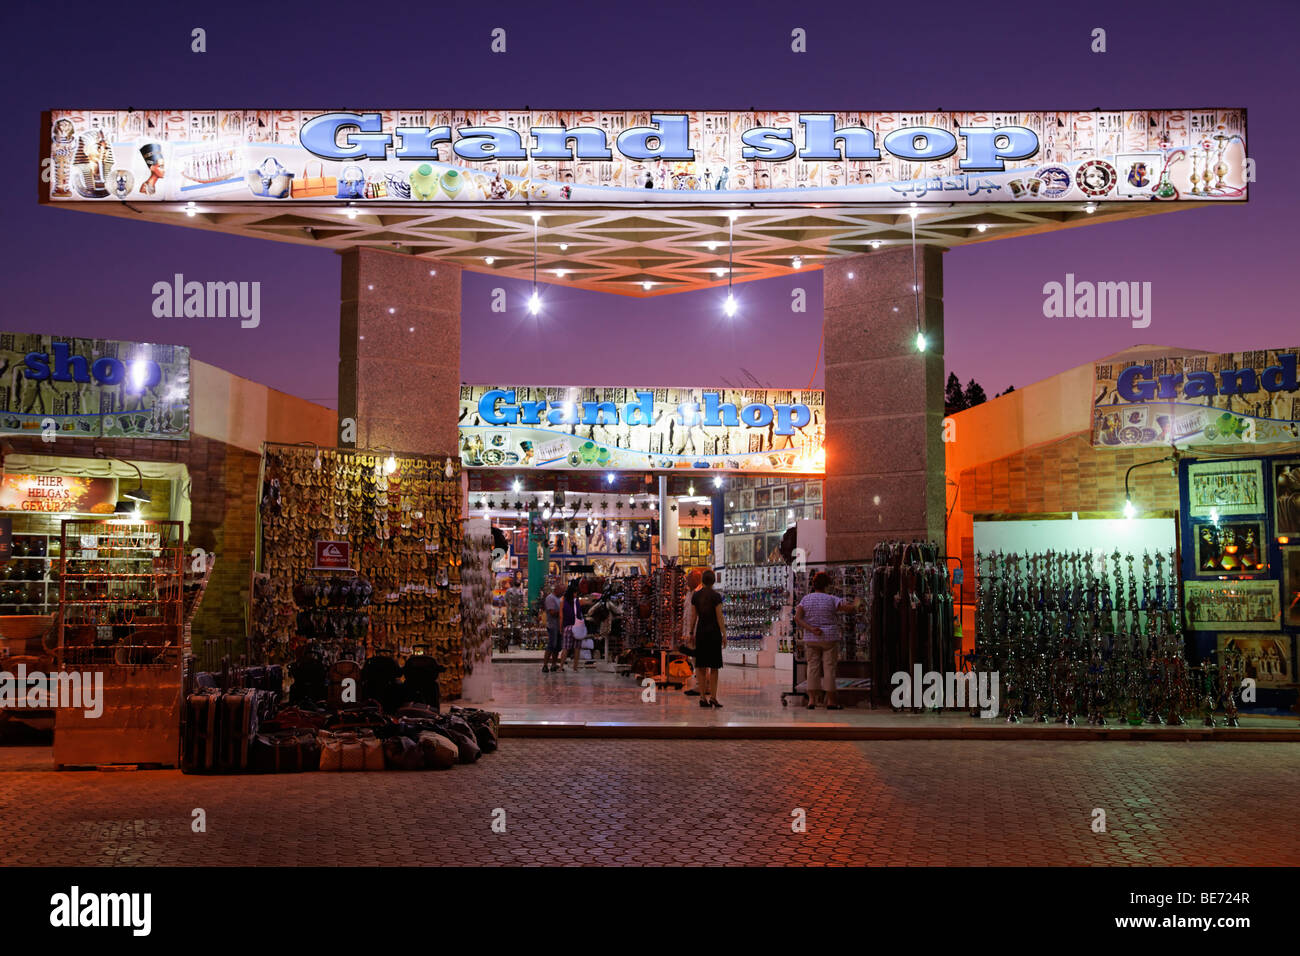 Souvenir shop, illuminated, evening, Yussuf Afifi road, Hurghada, Egypt, Red Sea, Africa Stock Photo